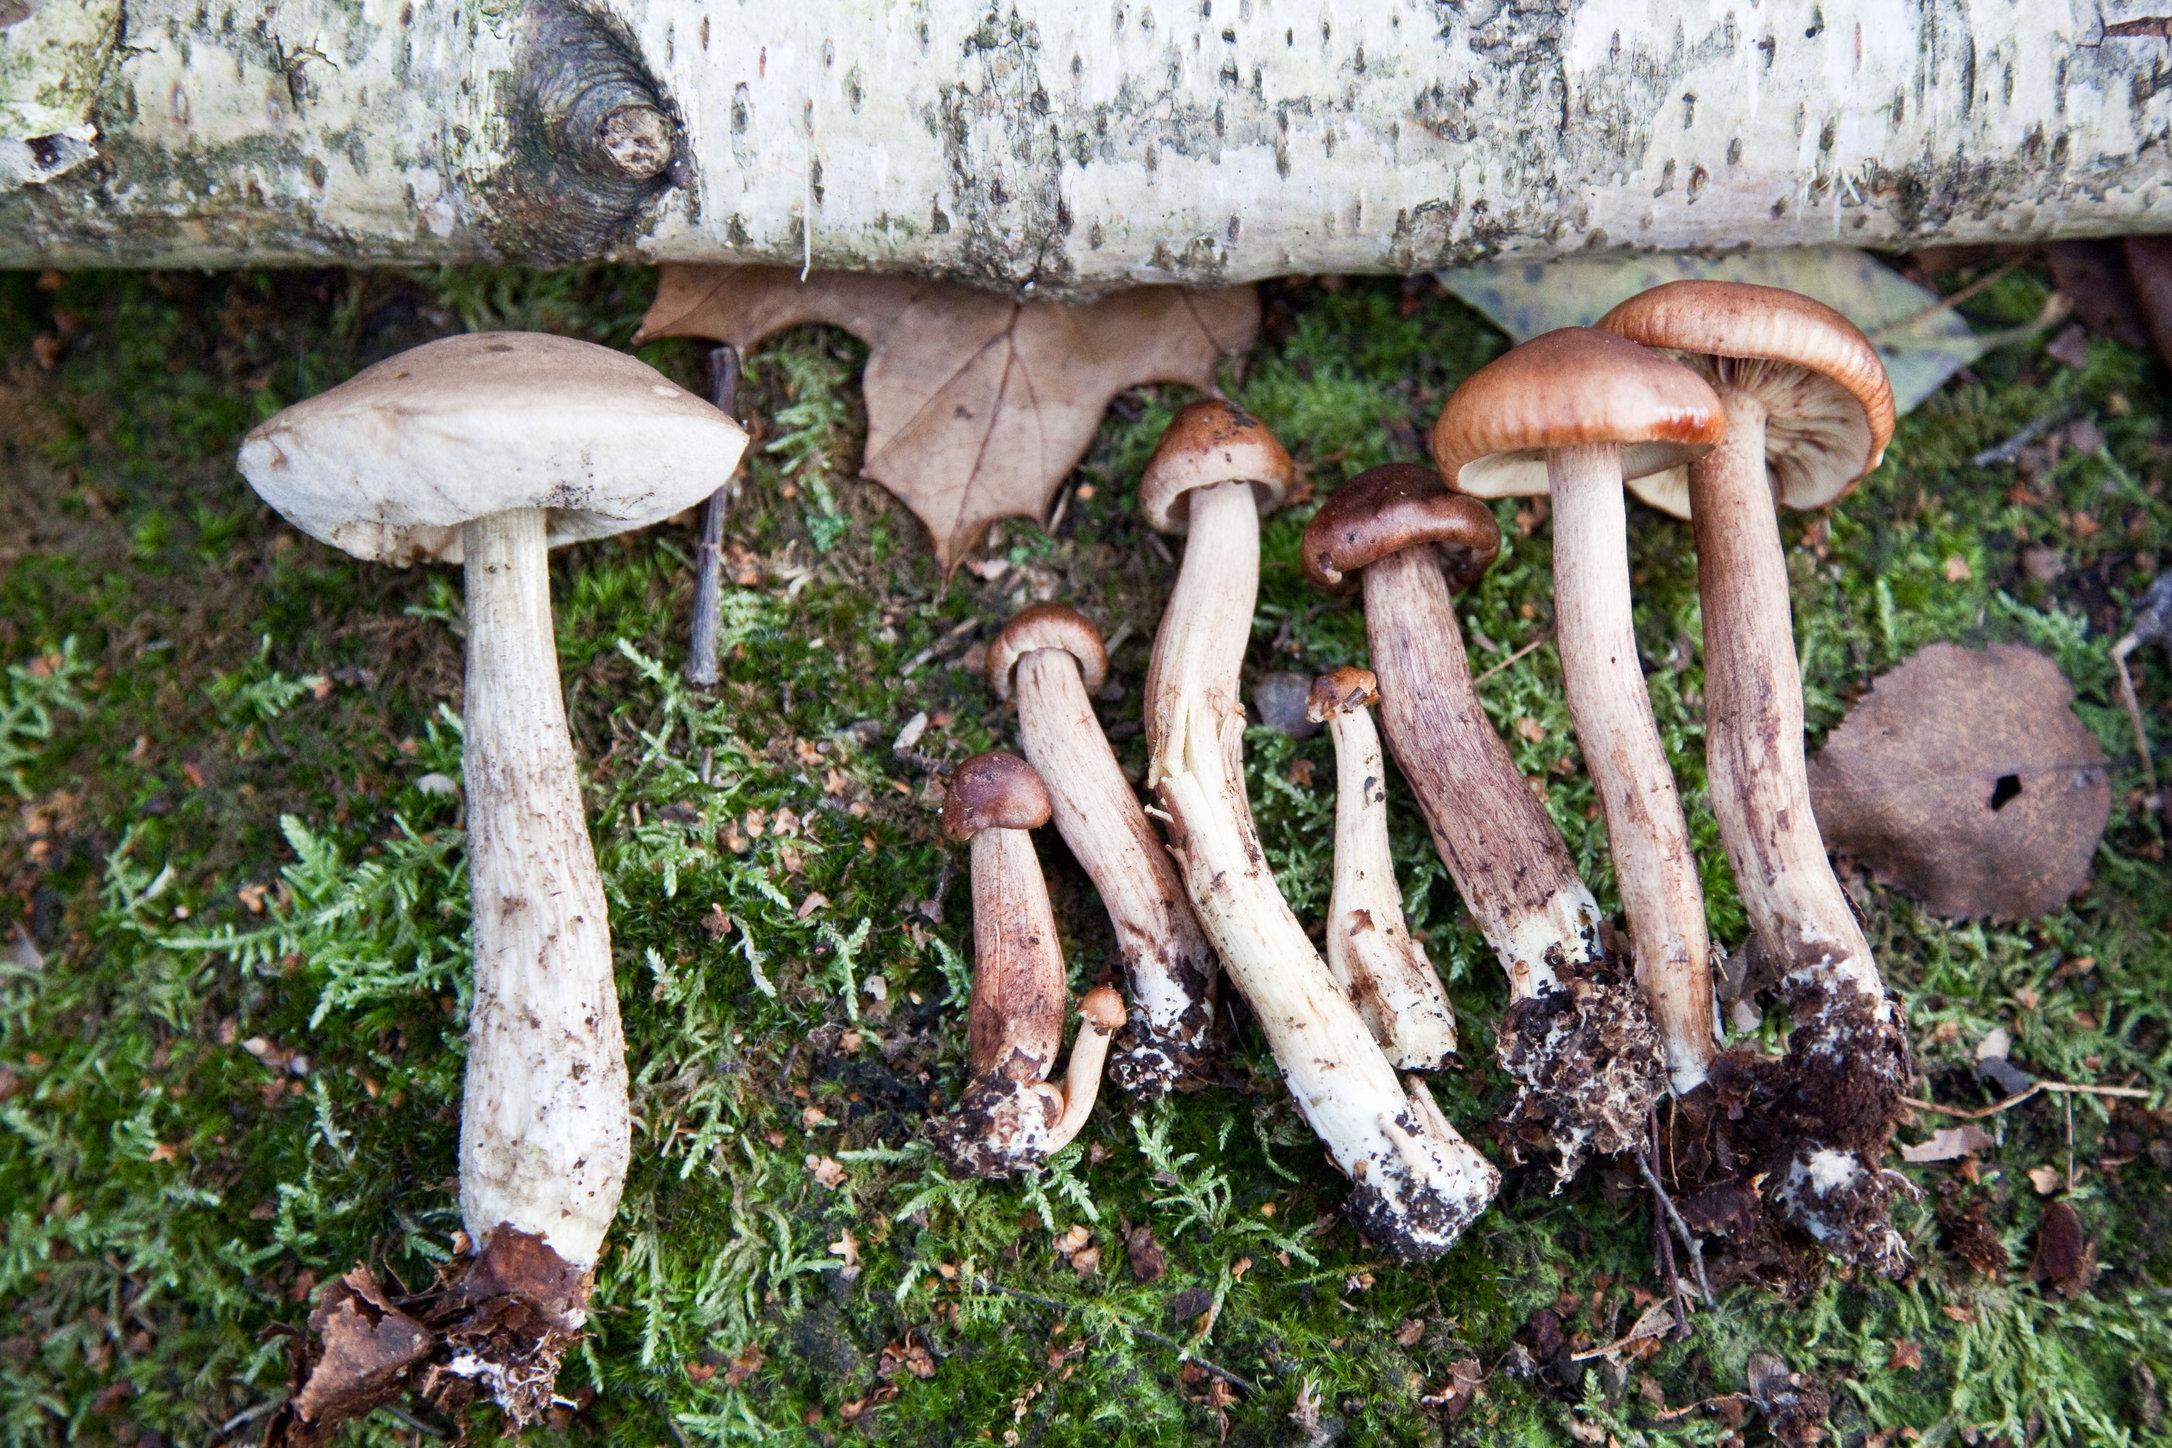 Mushroom_MG_0478.jpg